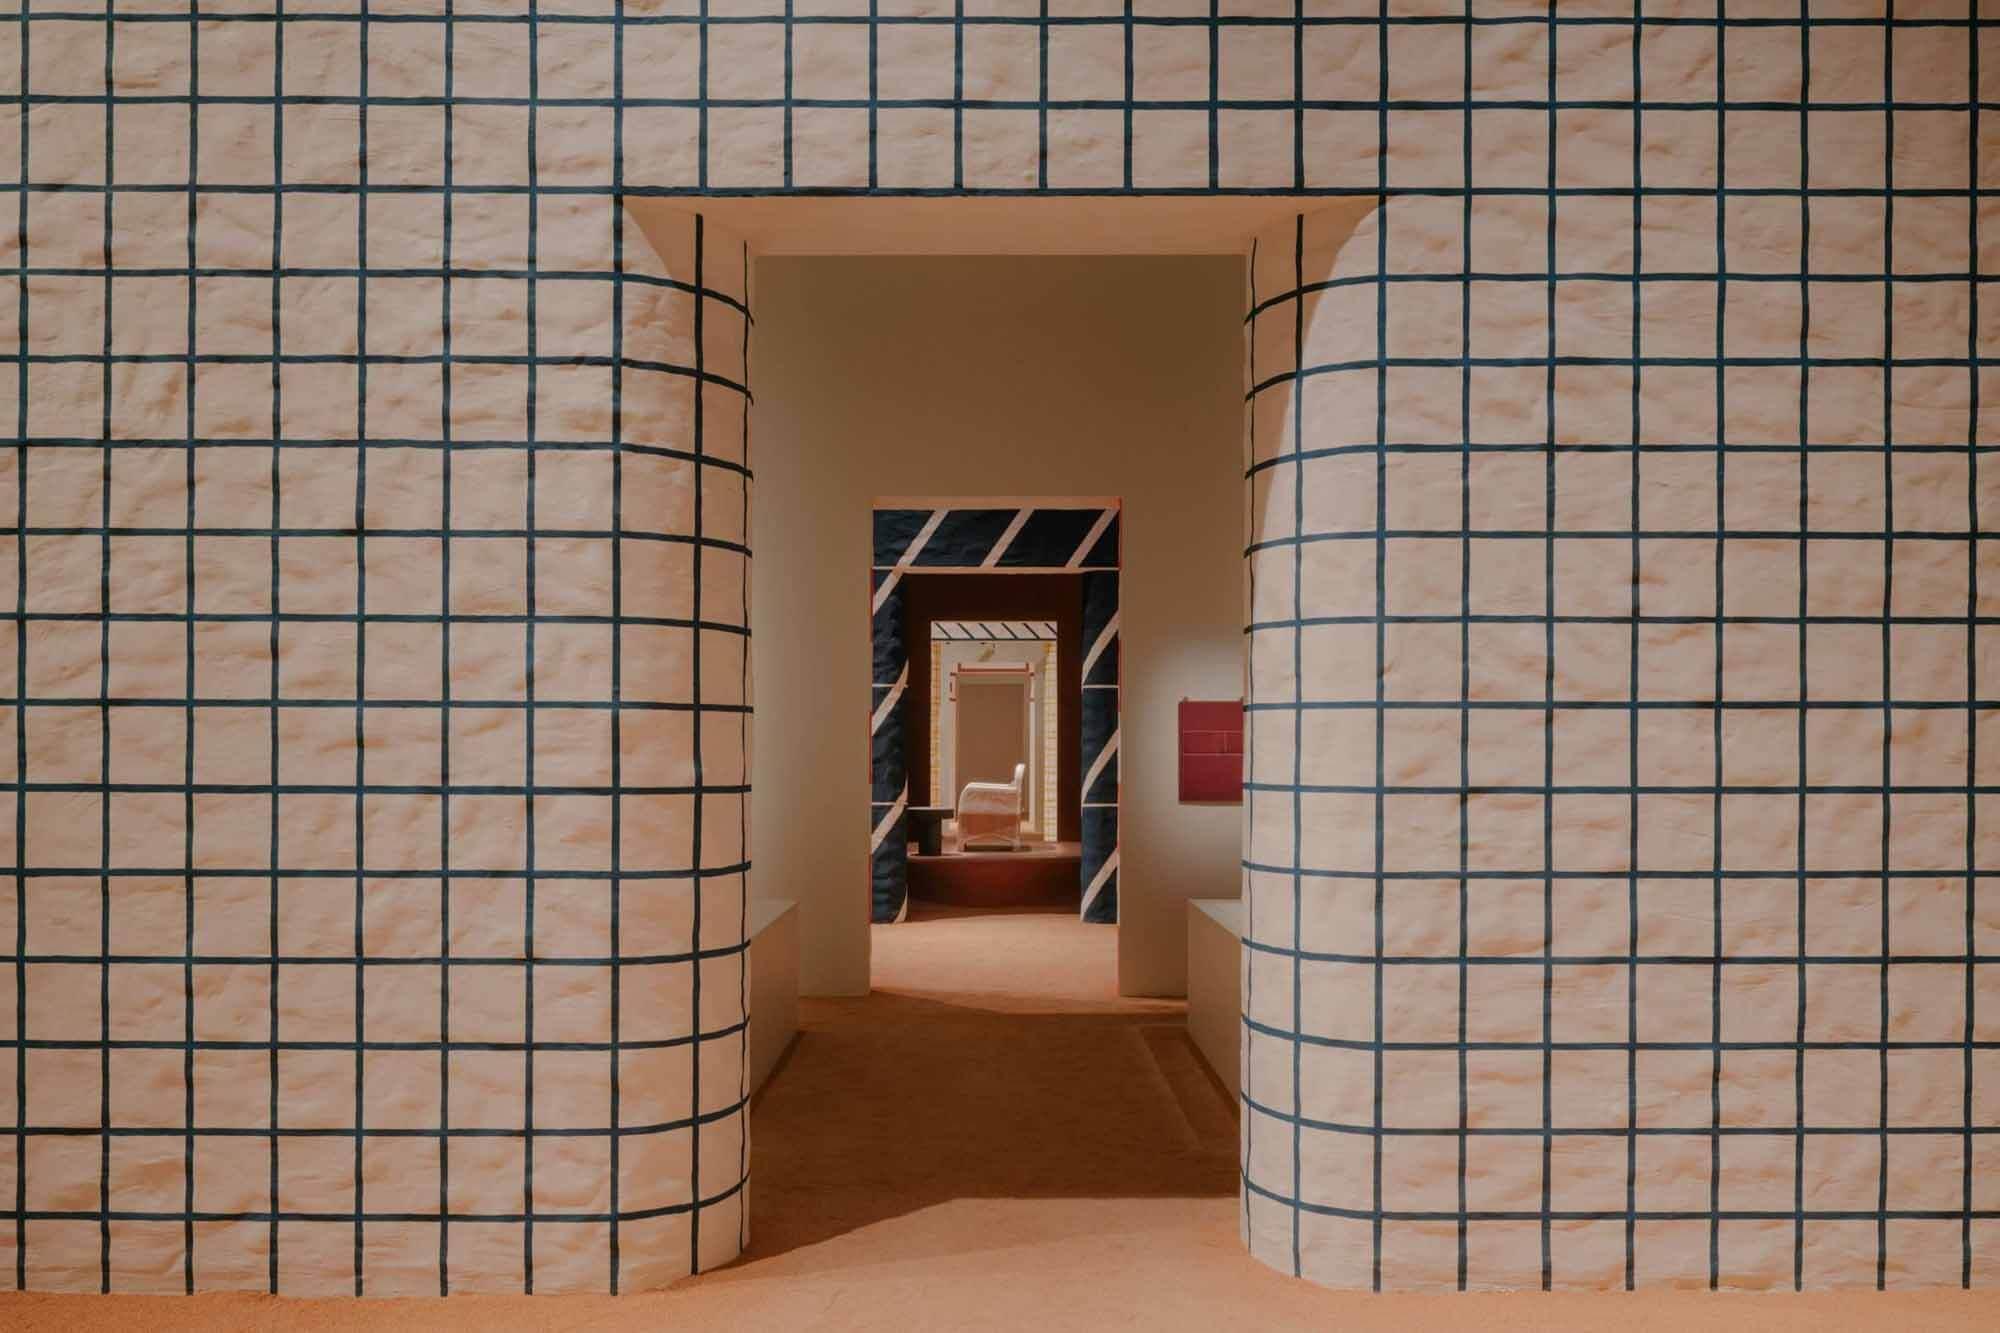 Коллекция мебели Hermès представлена пятью инсталляциями с ярким рисунком.